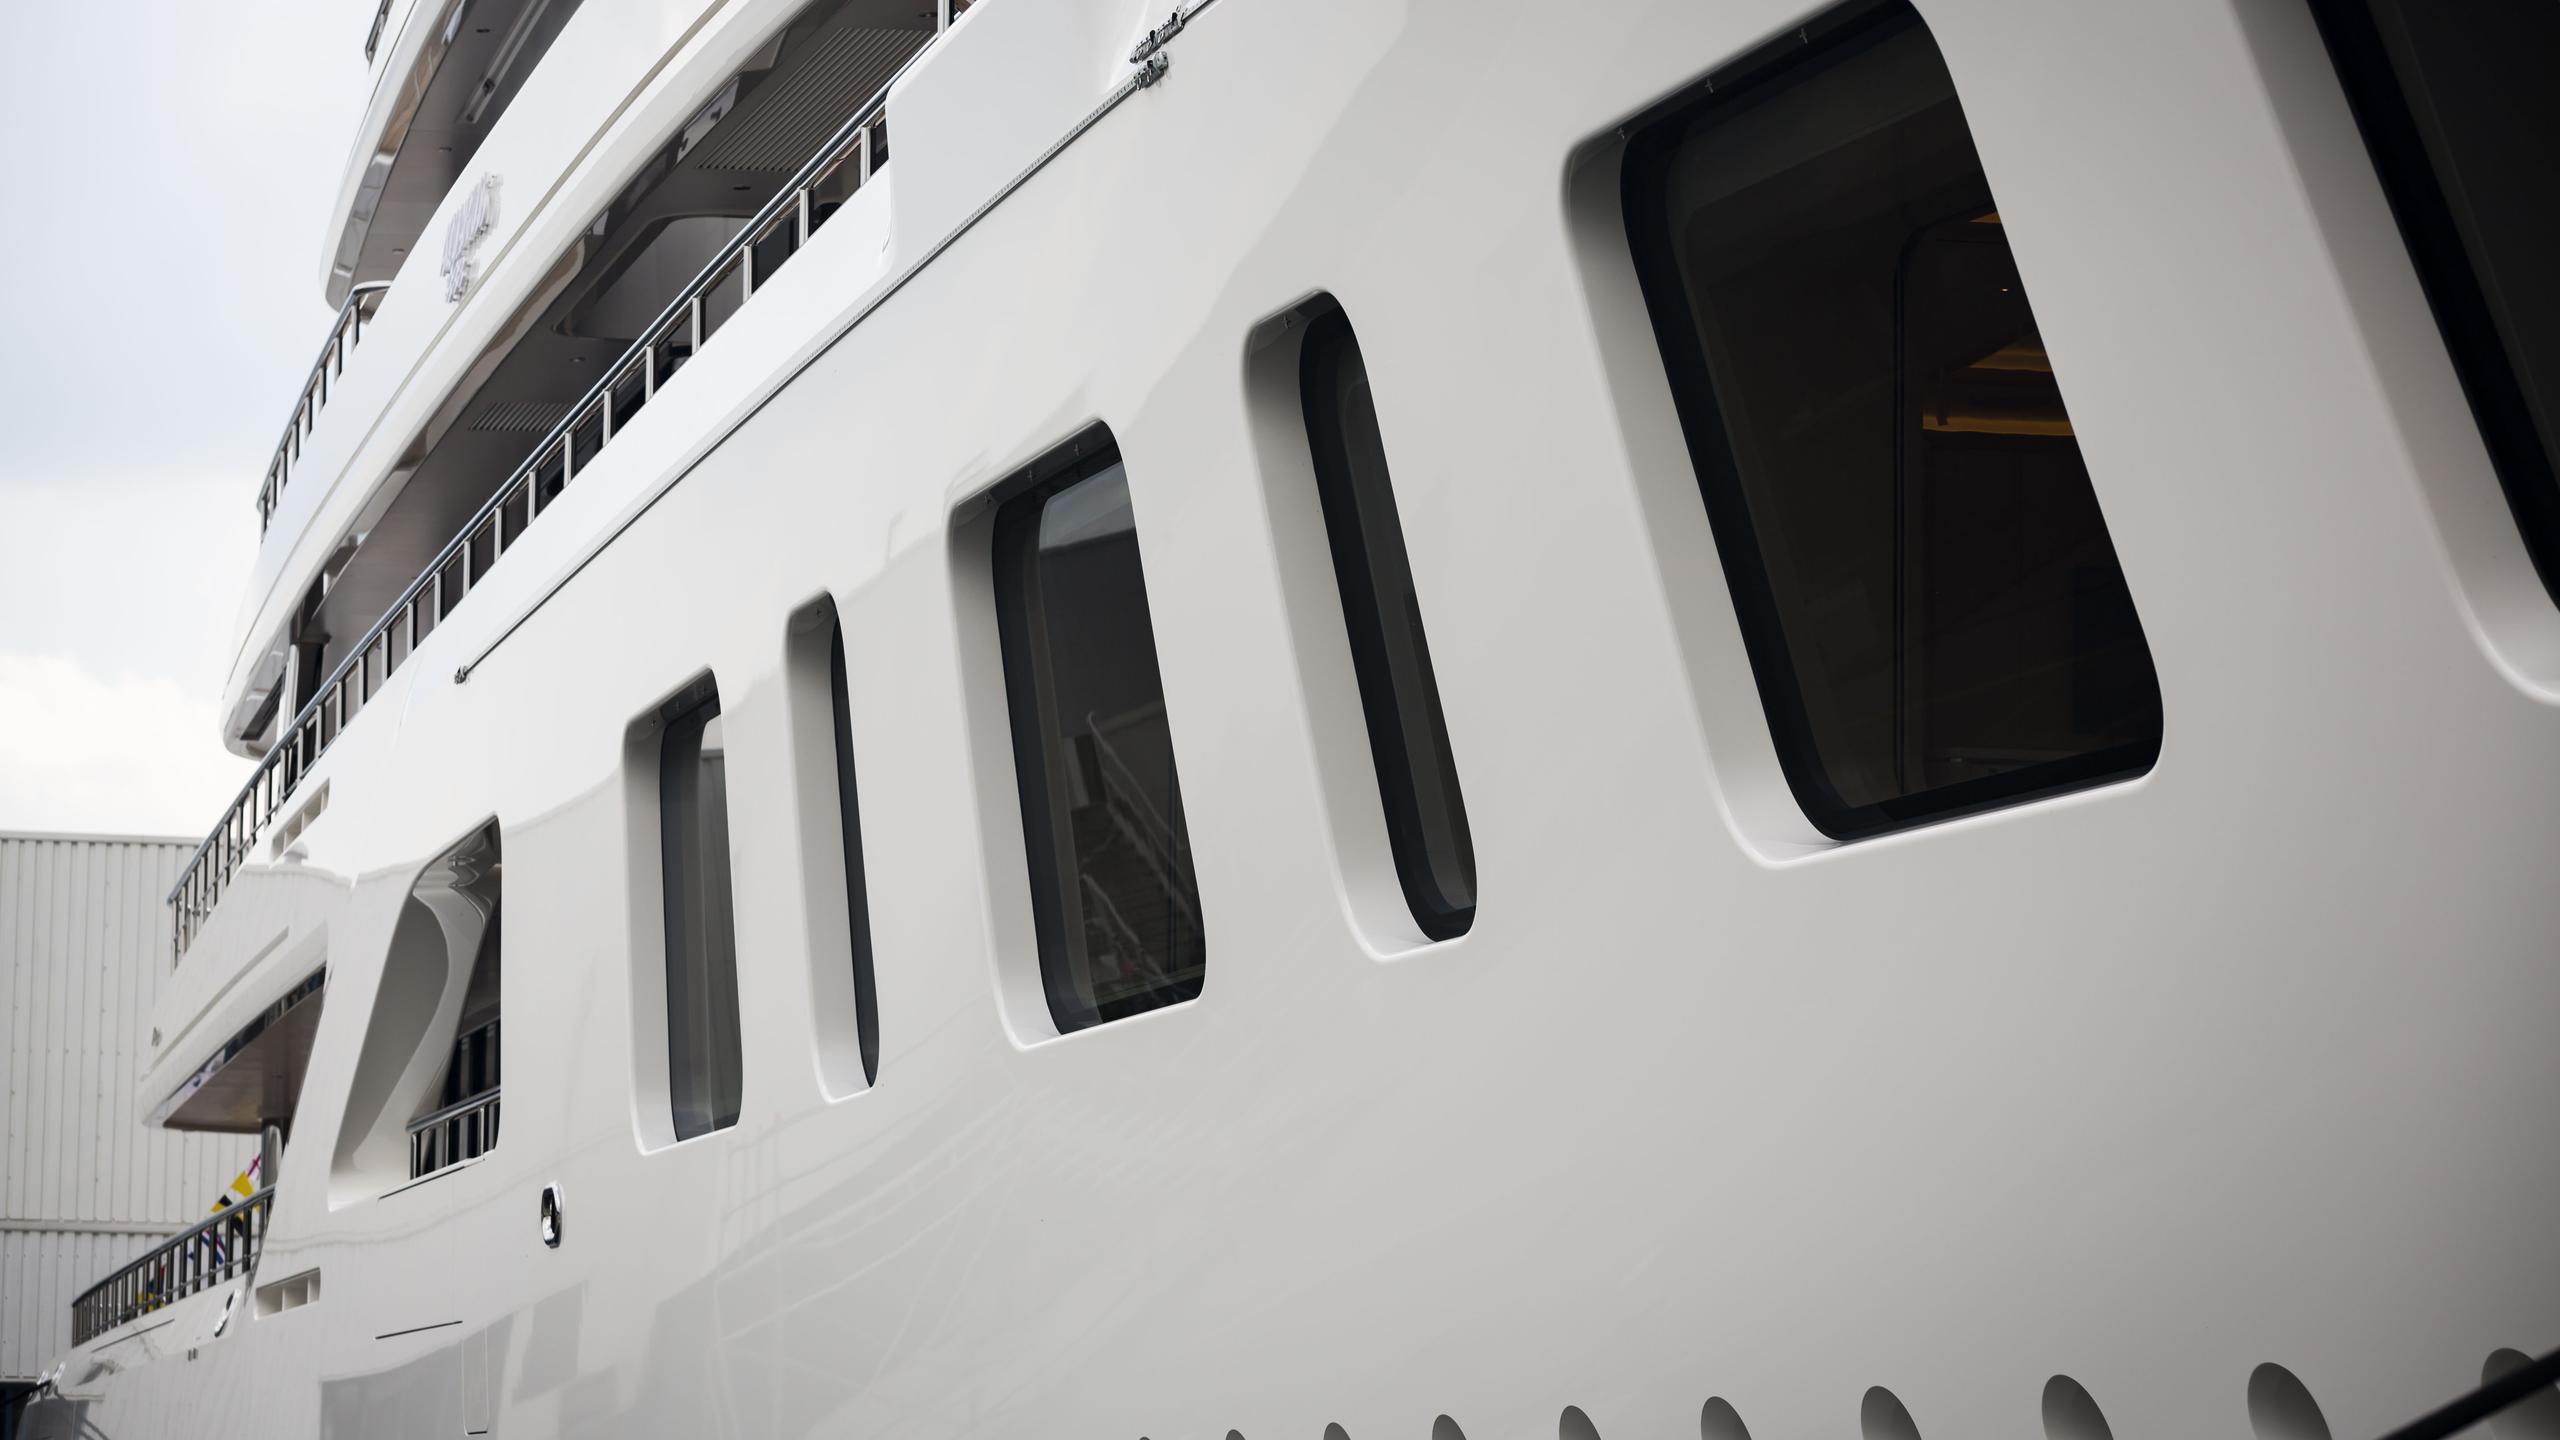 aquarius motoryacht feadship 2016 92m porthole details